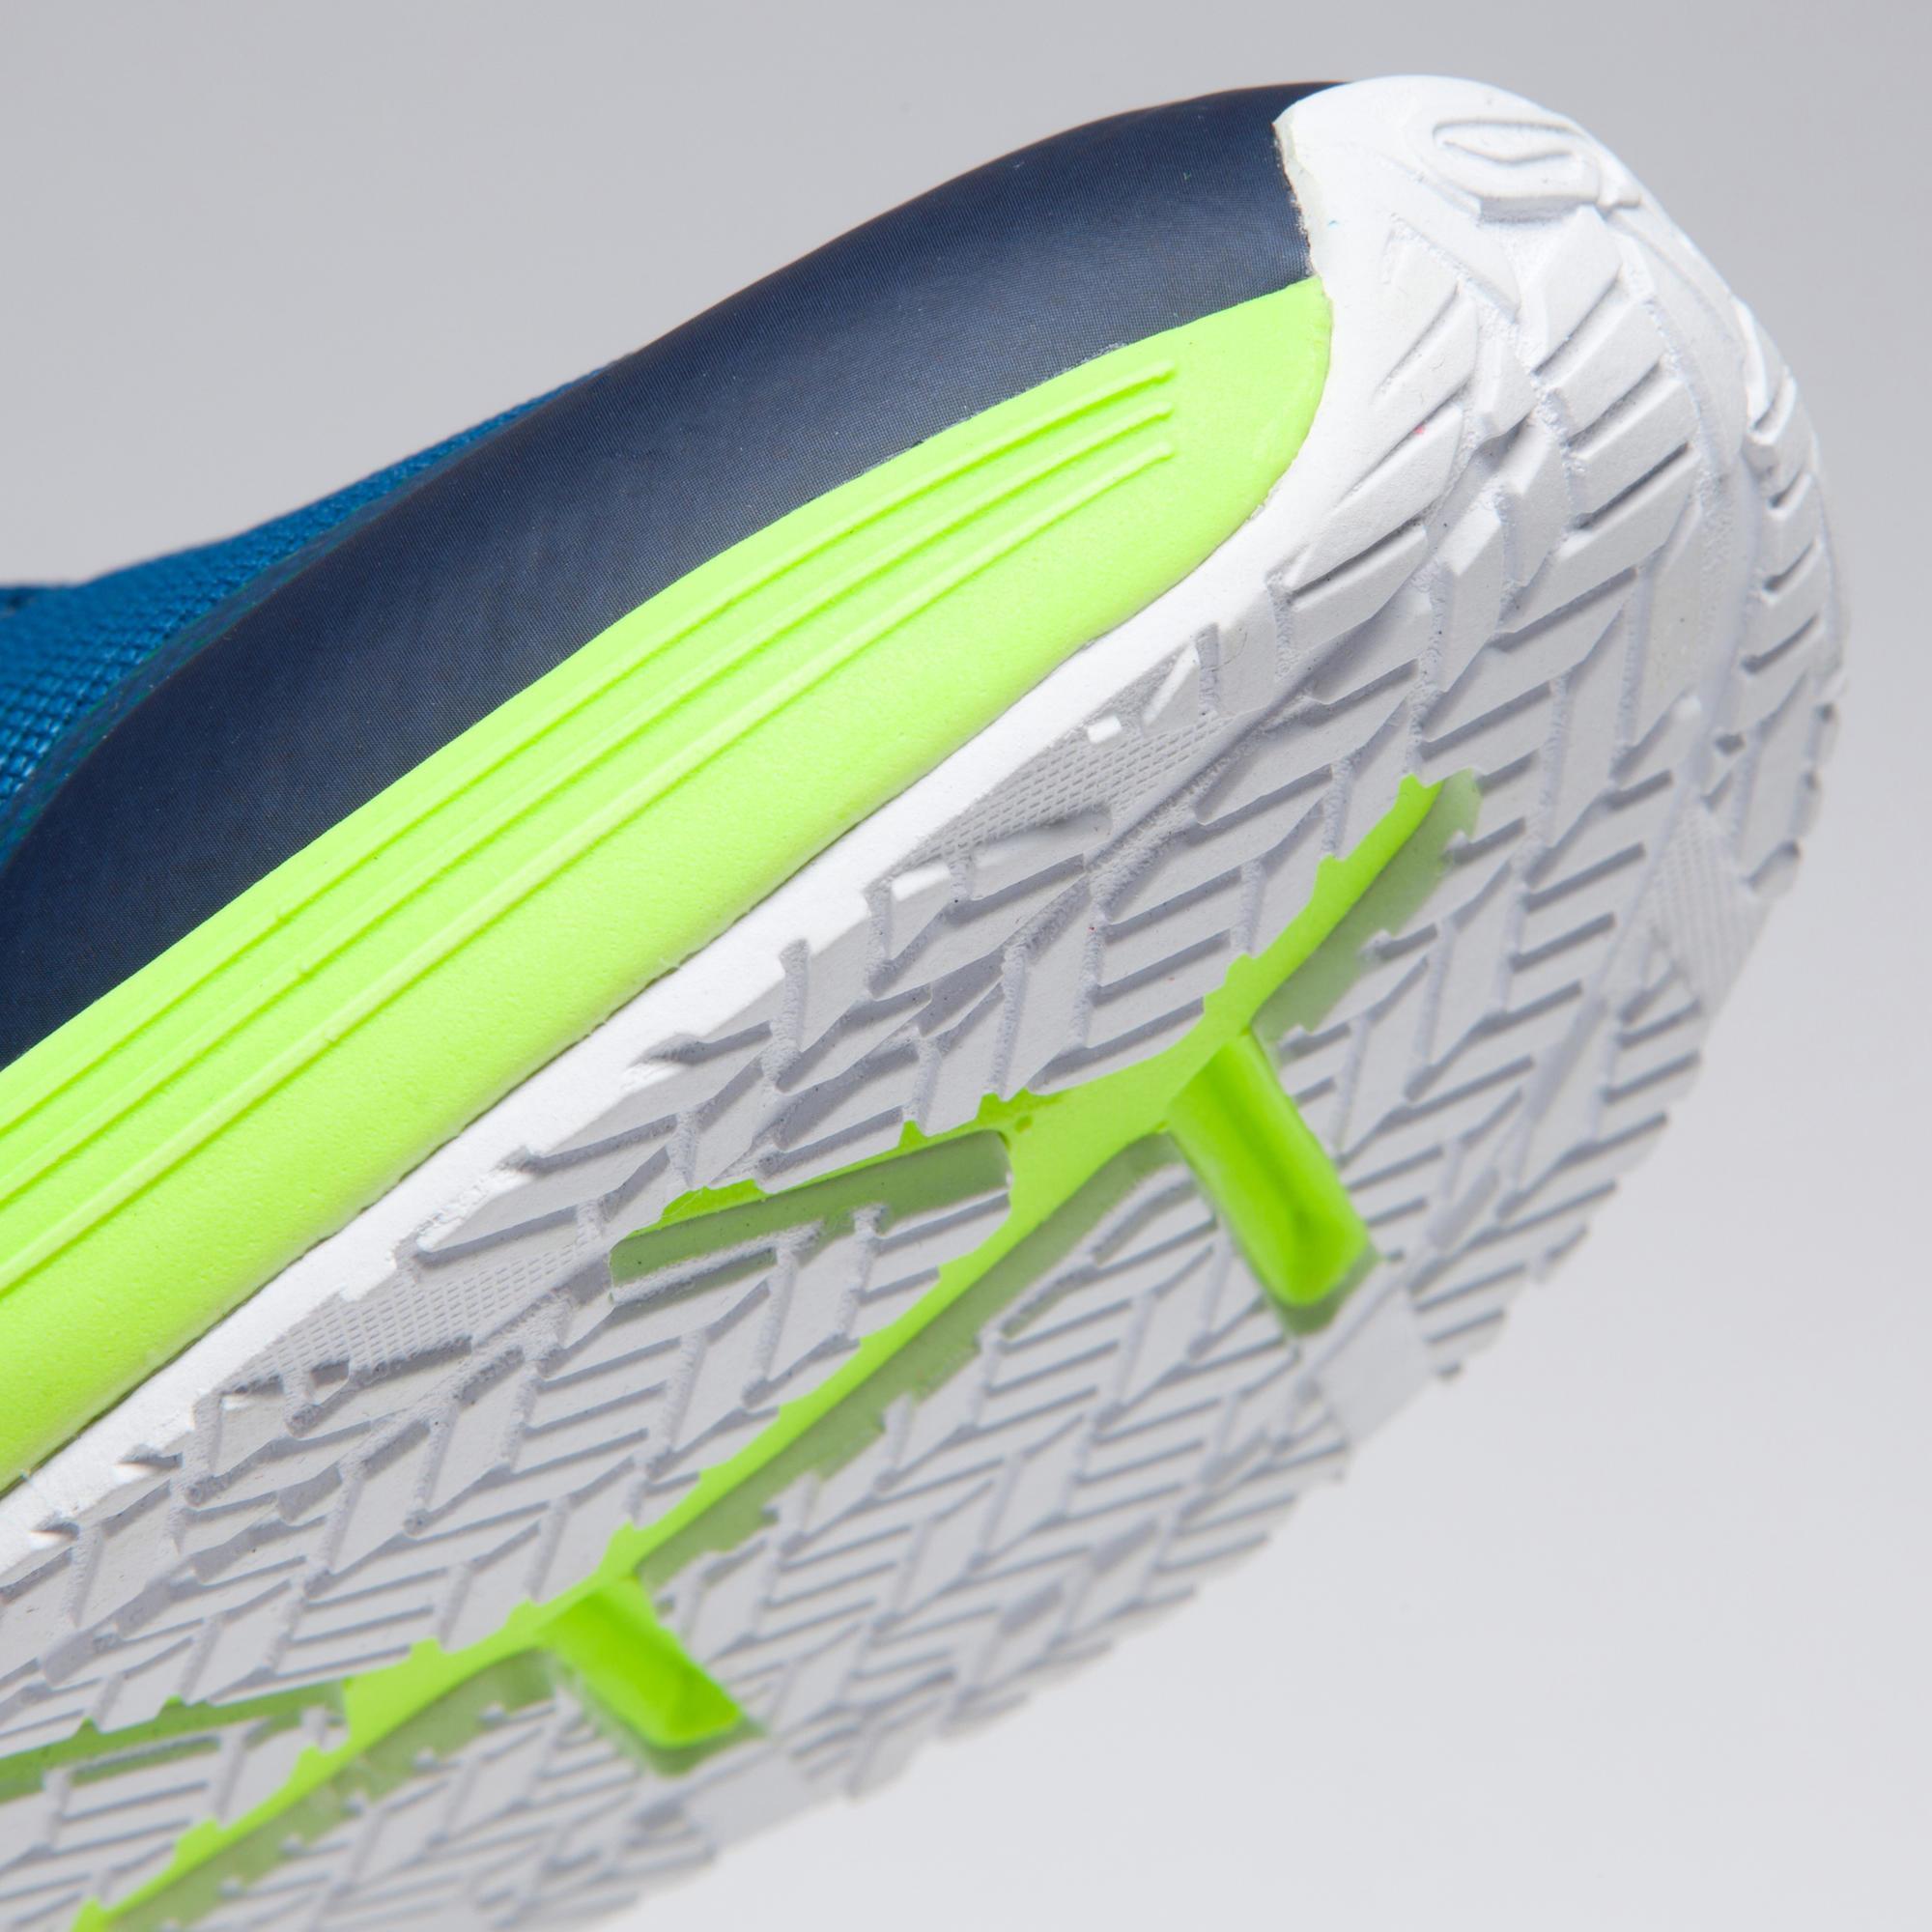 5e64e53bf2e5 A6wuxv Decathlon Kalenji Athlétisme Chaussures Kiprun Enfant wZ7Xxnq .